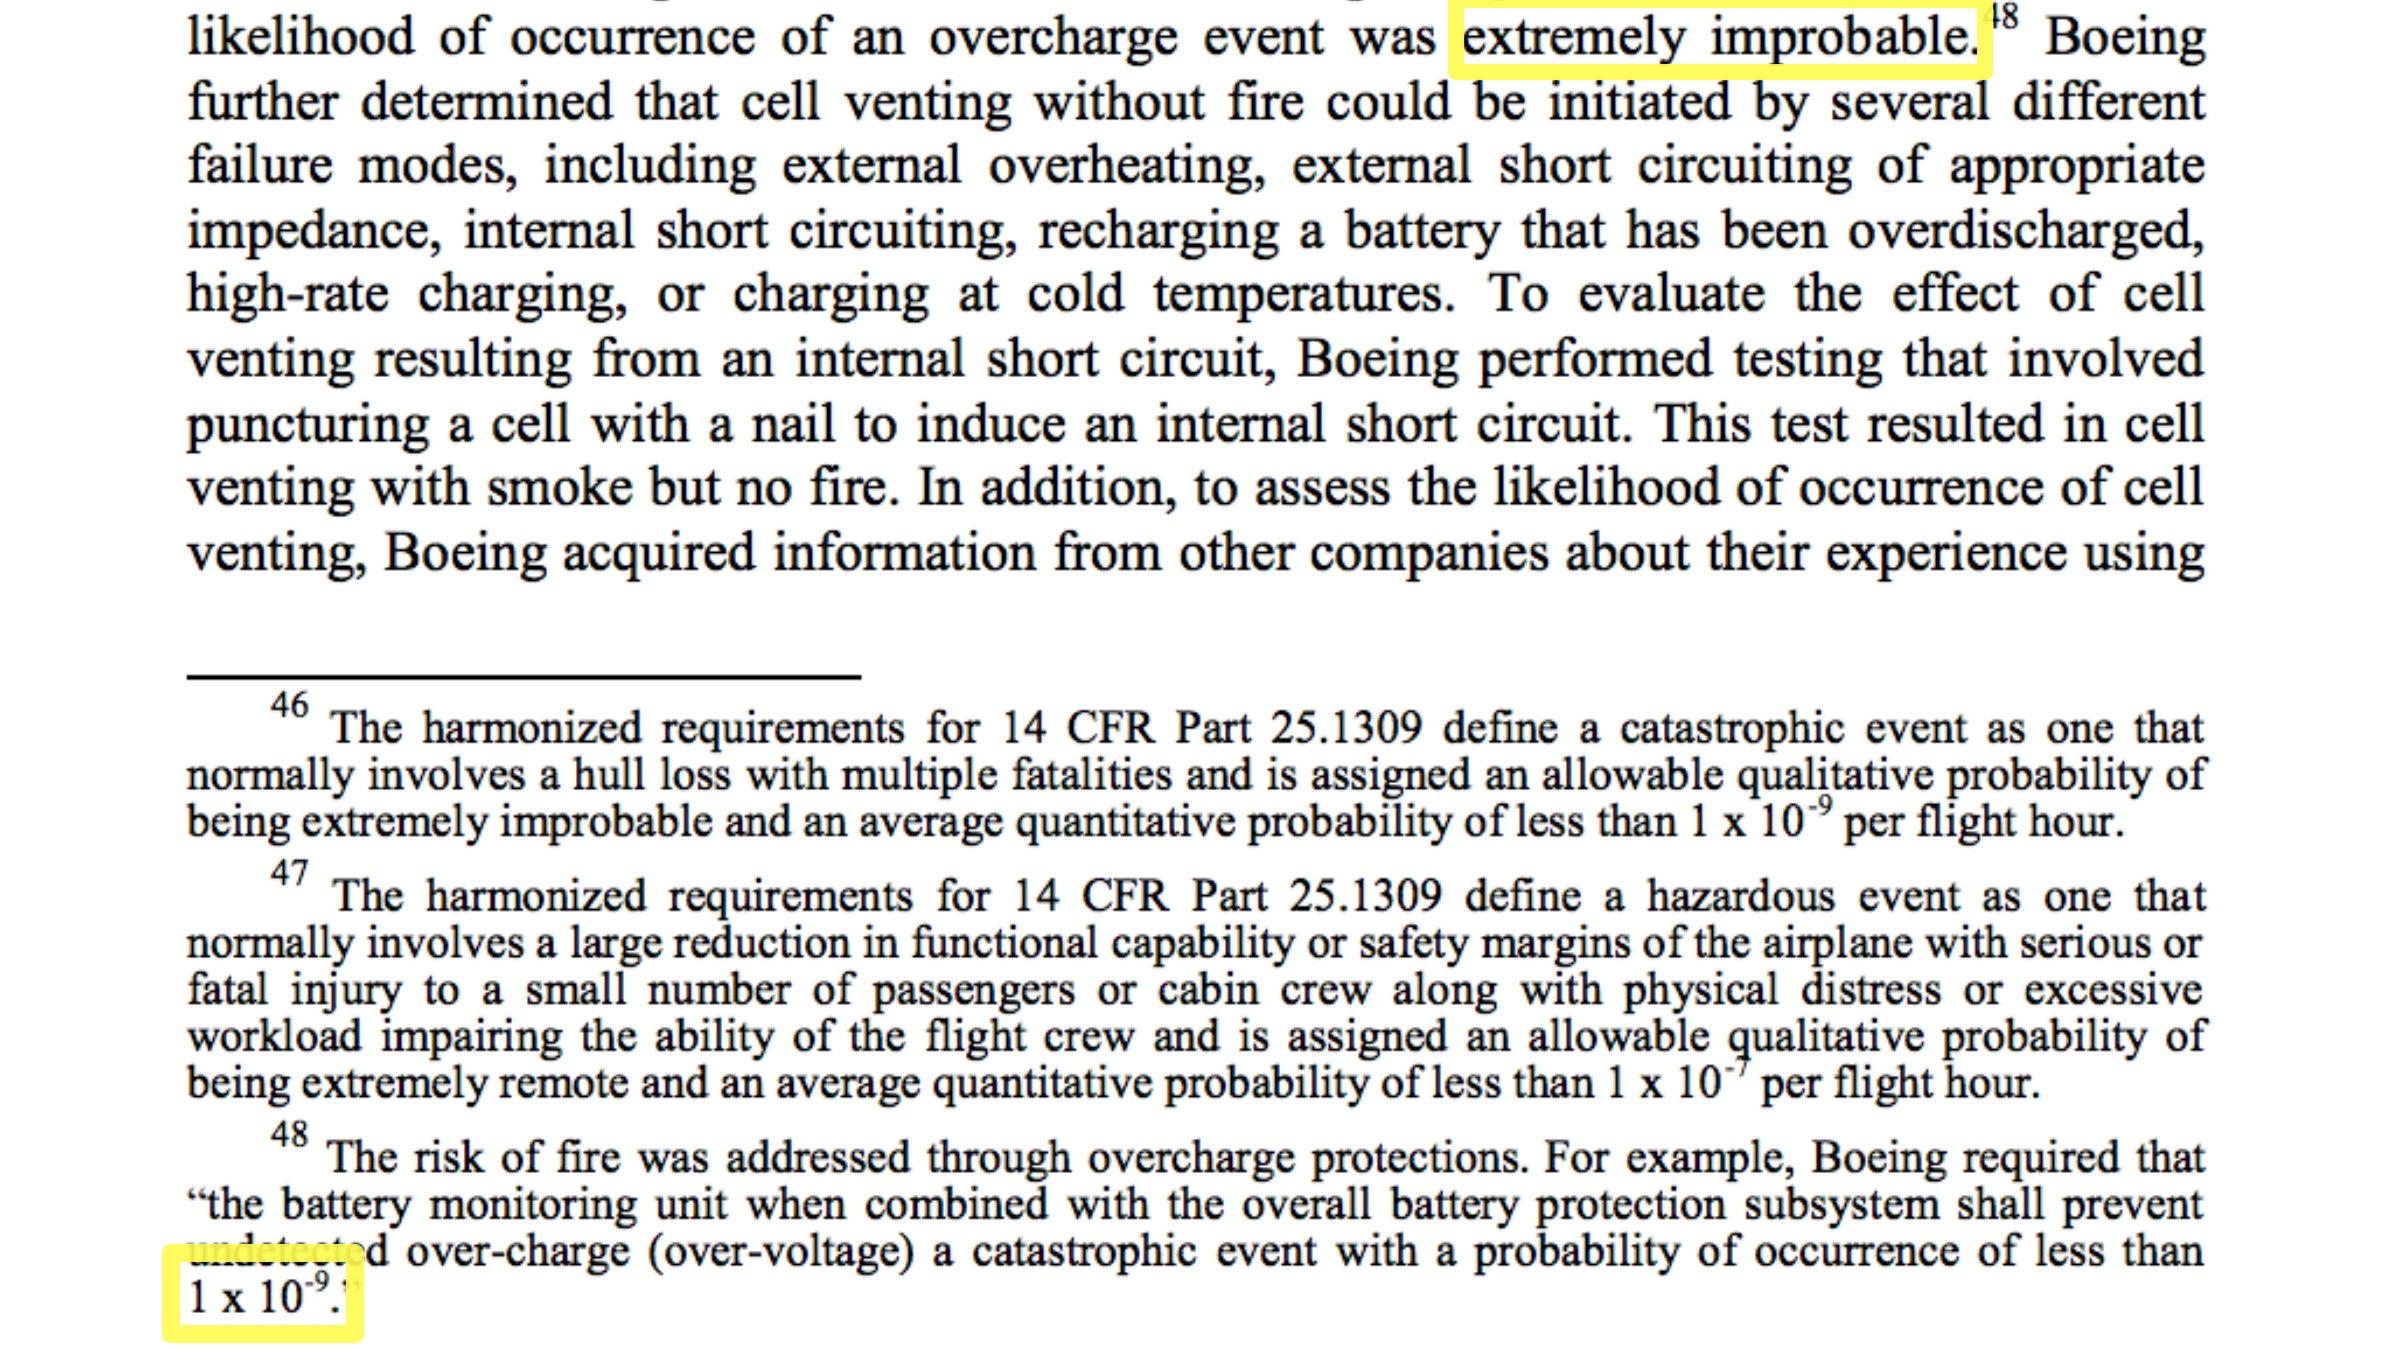 NTSB dreamliner report